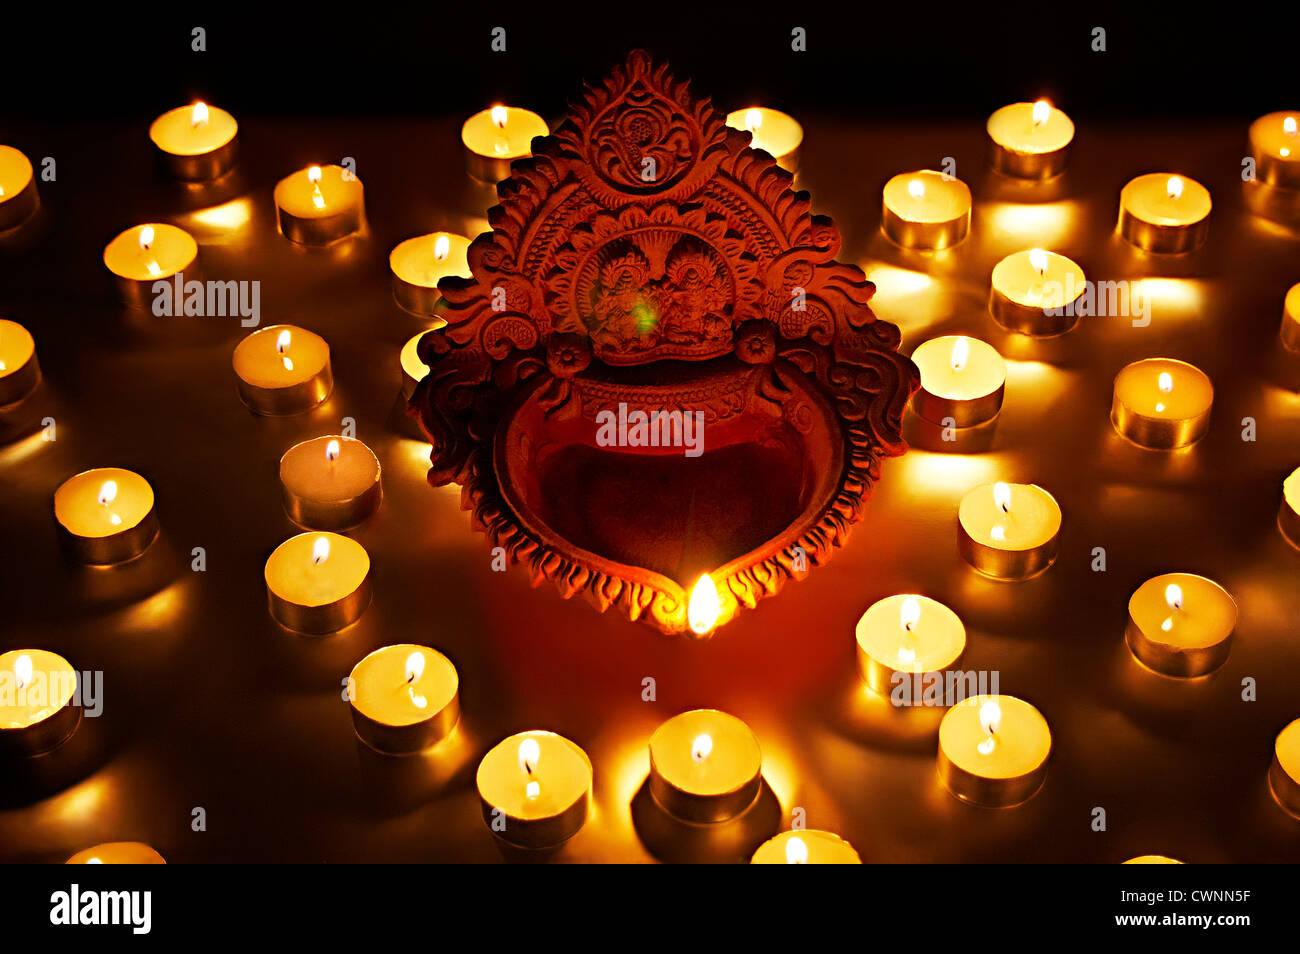 Diwali Diyas Online Shopping India: Diya's Are Burning On Diwali Festival India Stock Photo